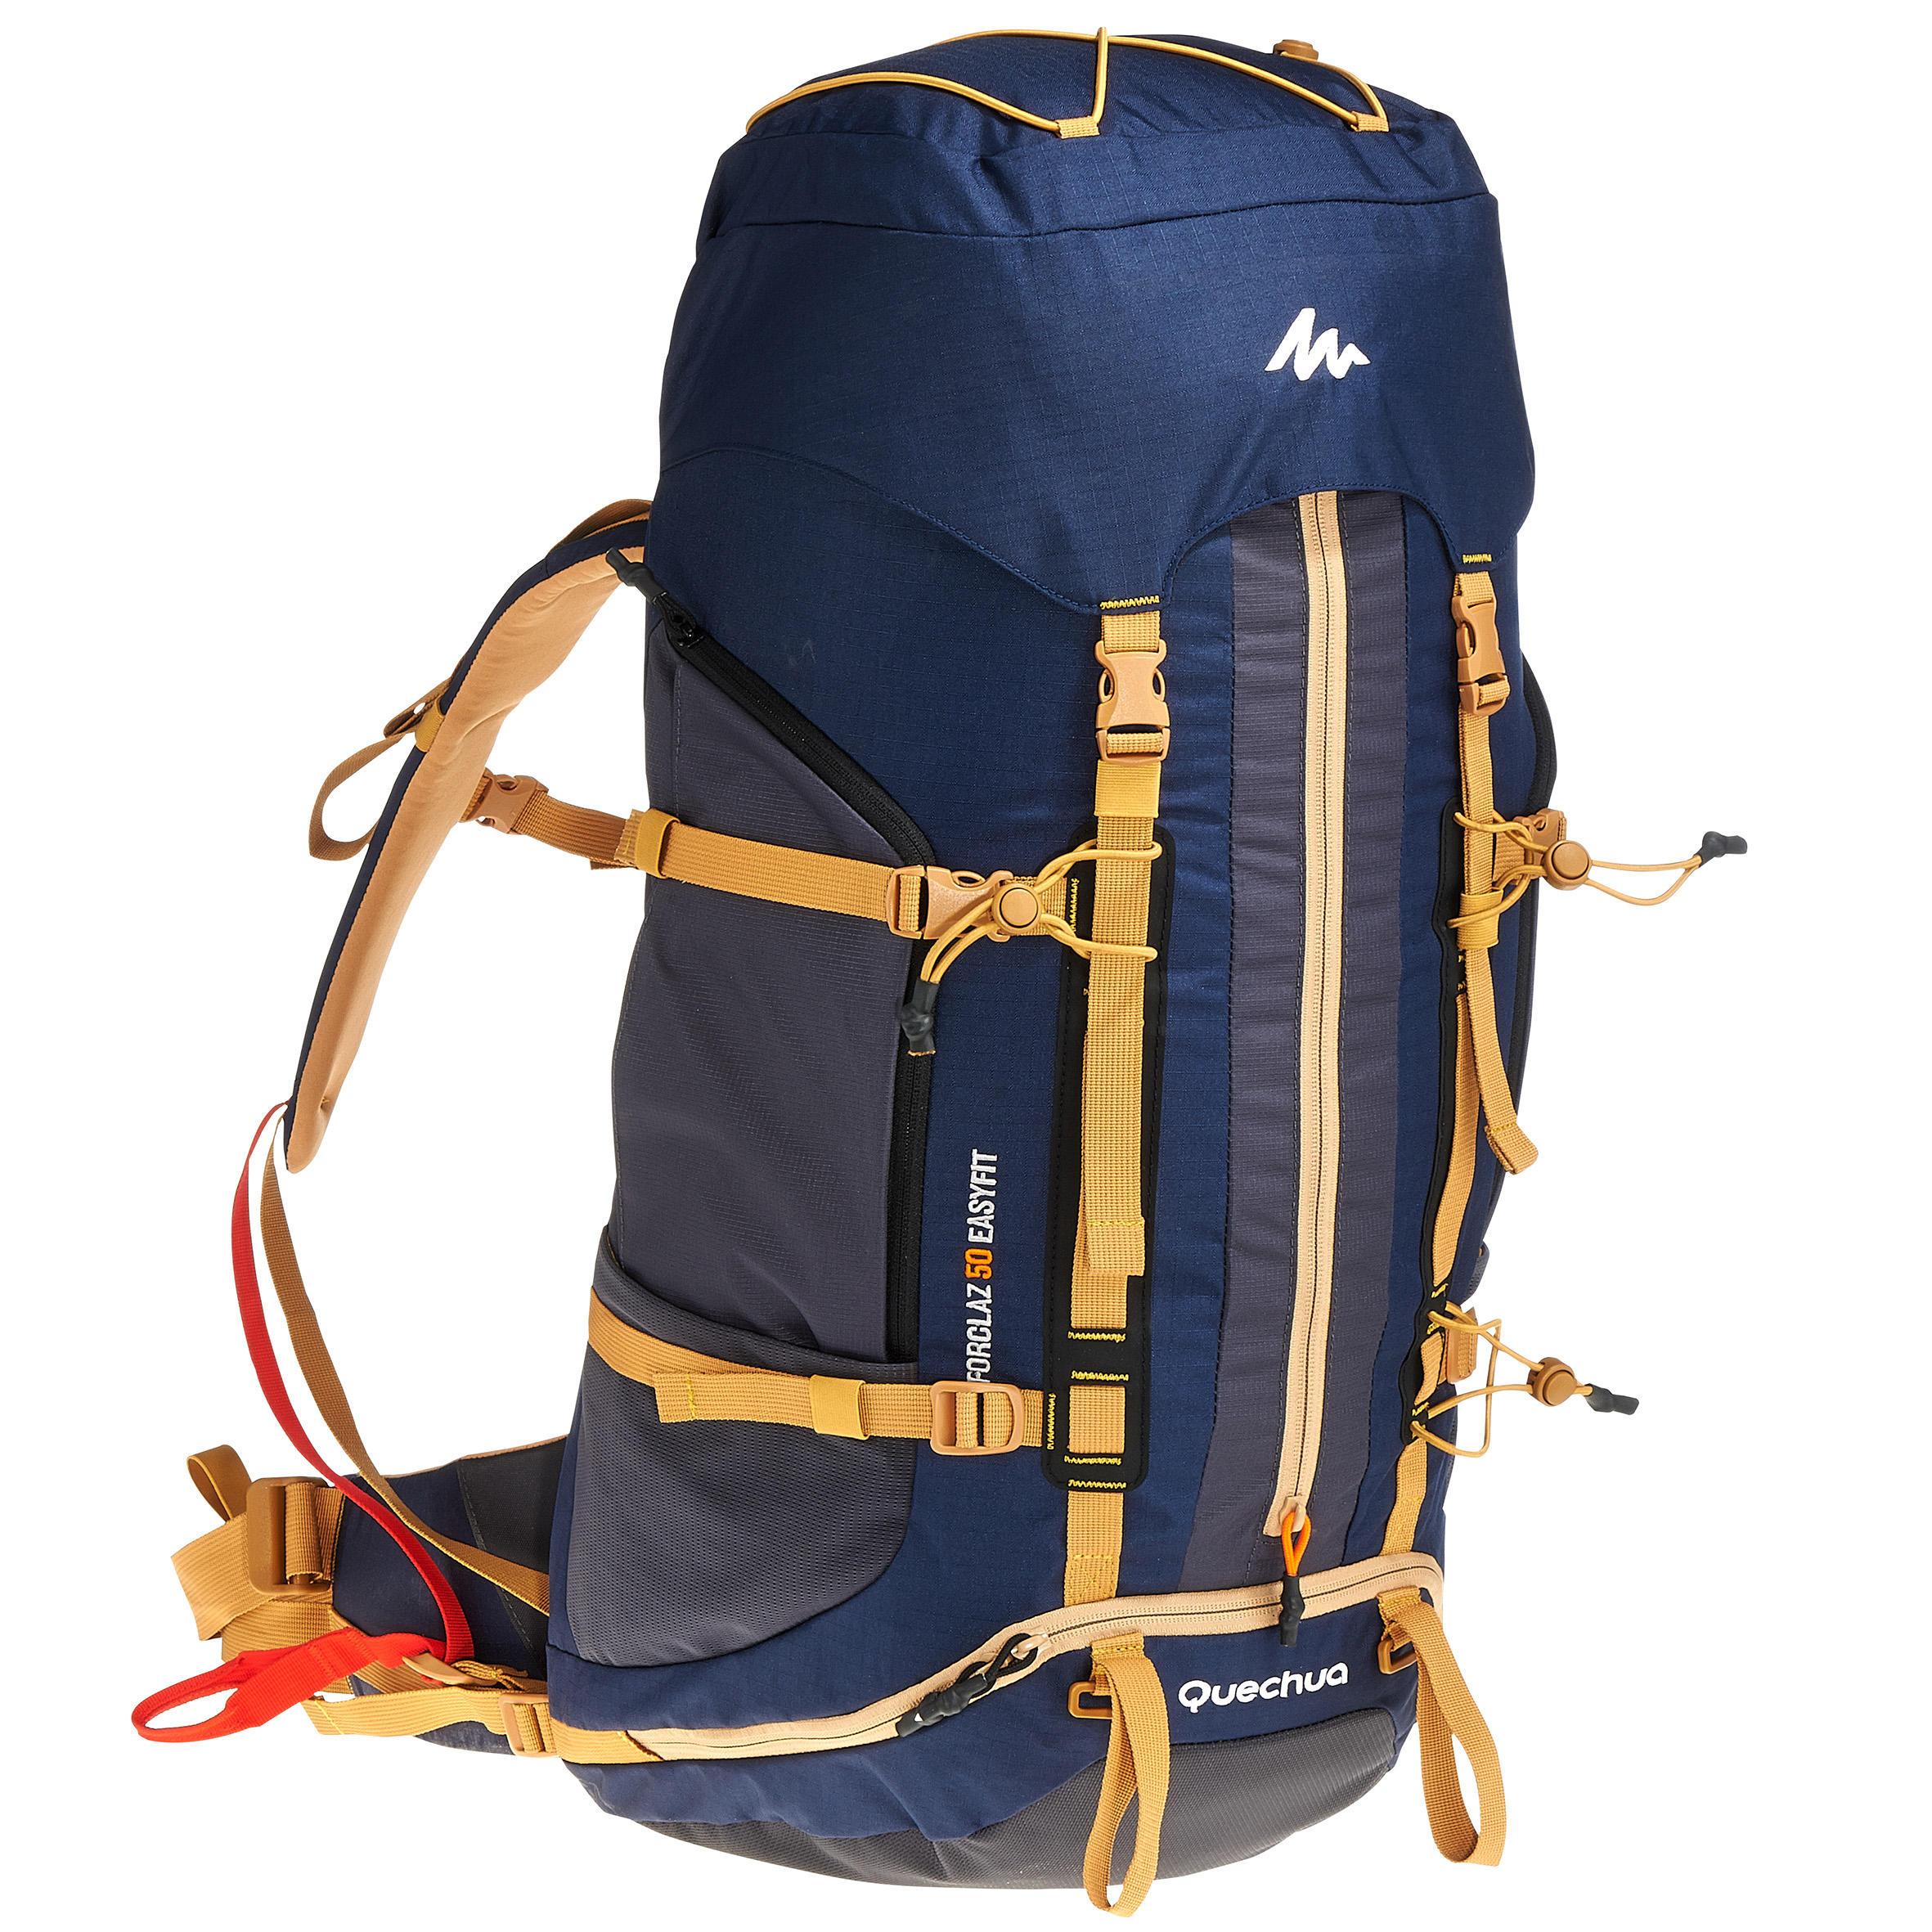 Easyfit 50 L Men's Trekking Backpack - Blue